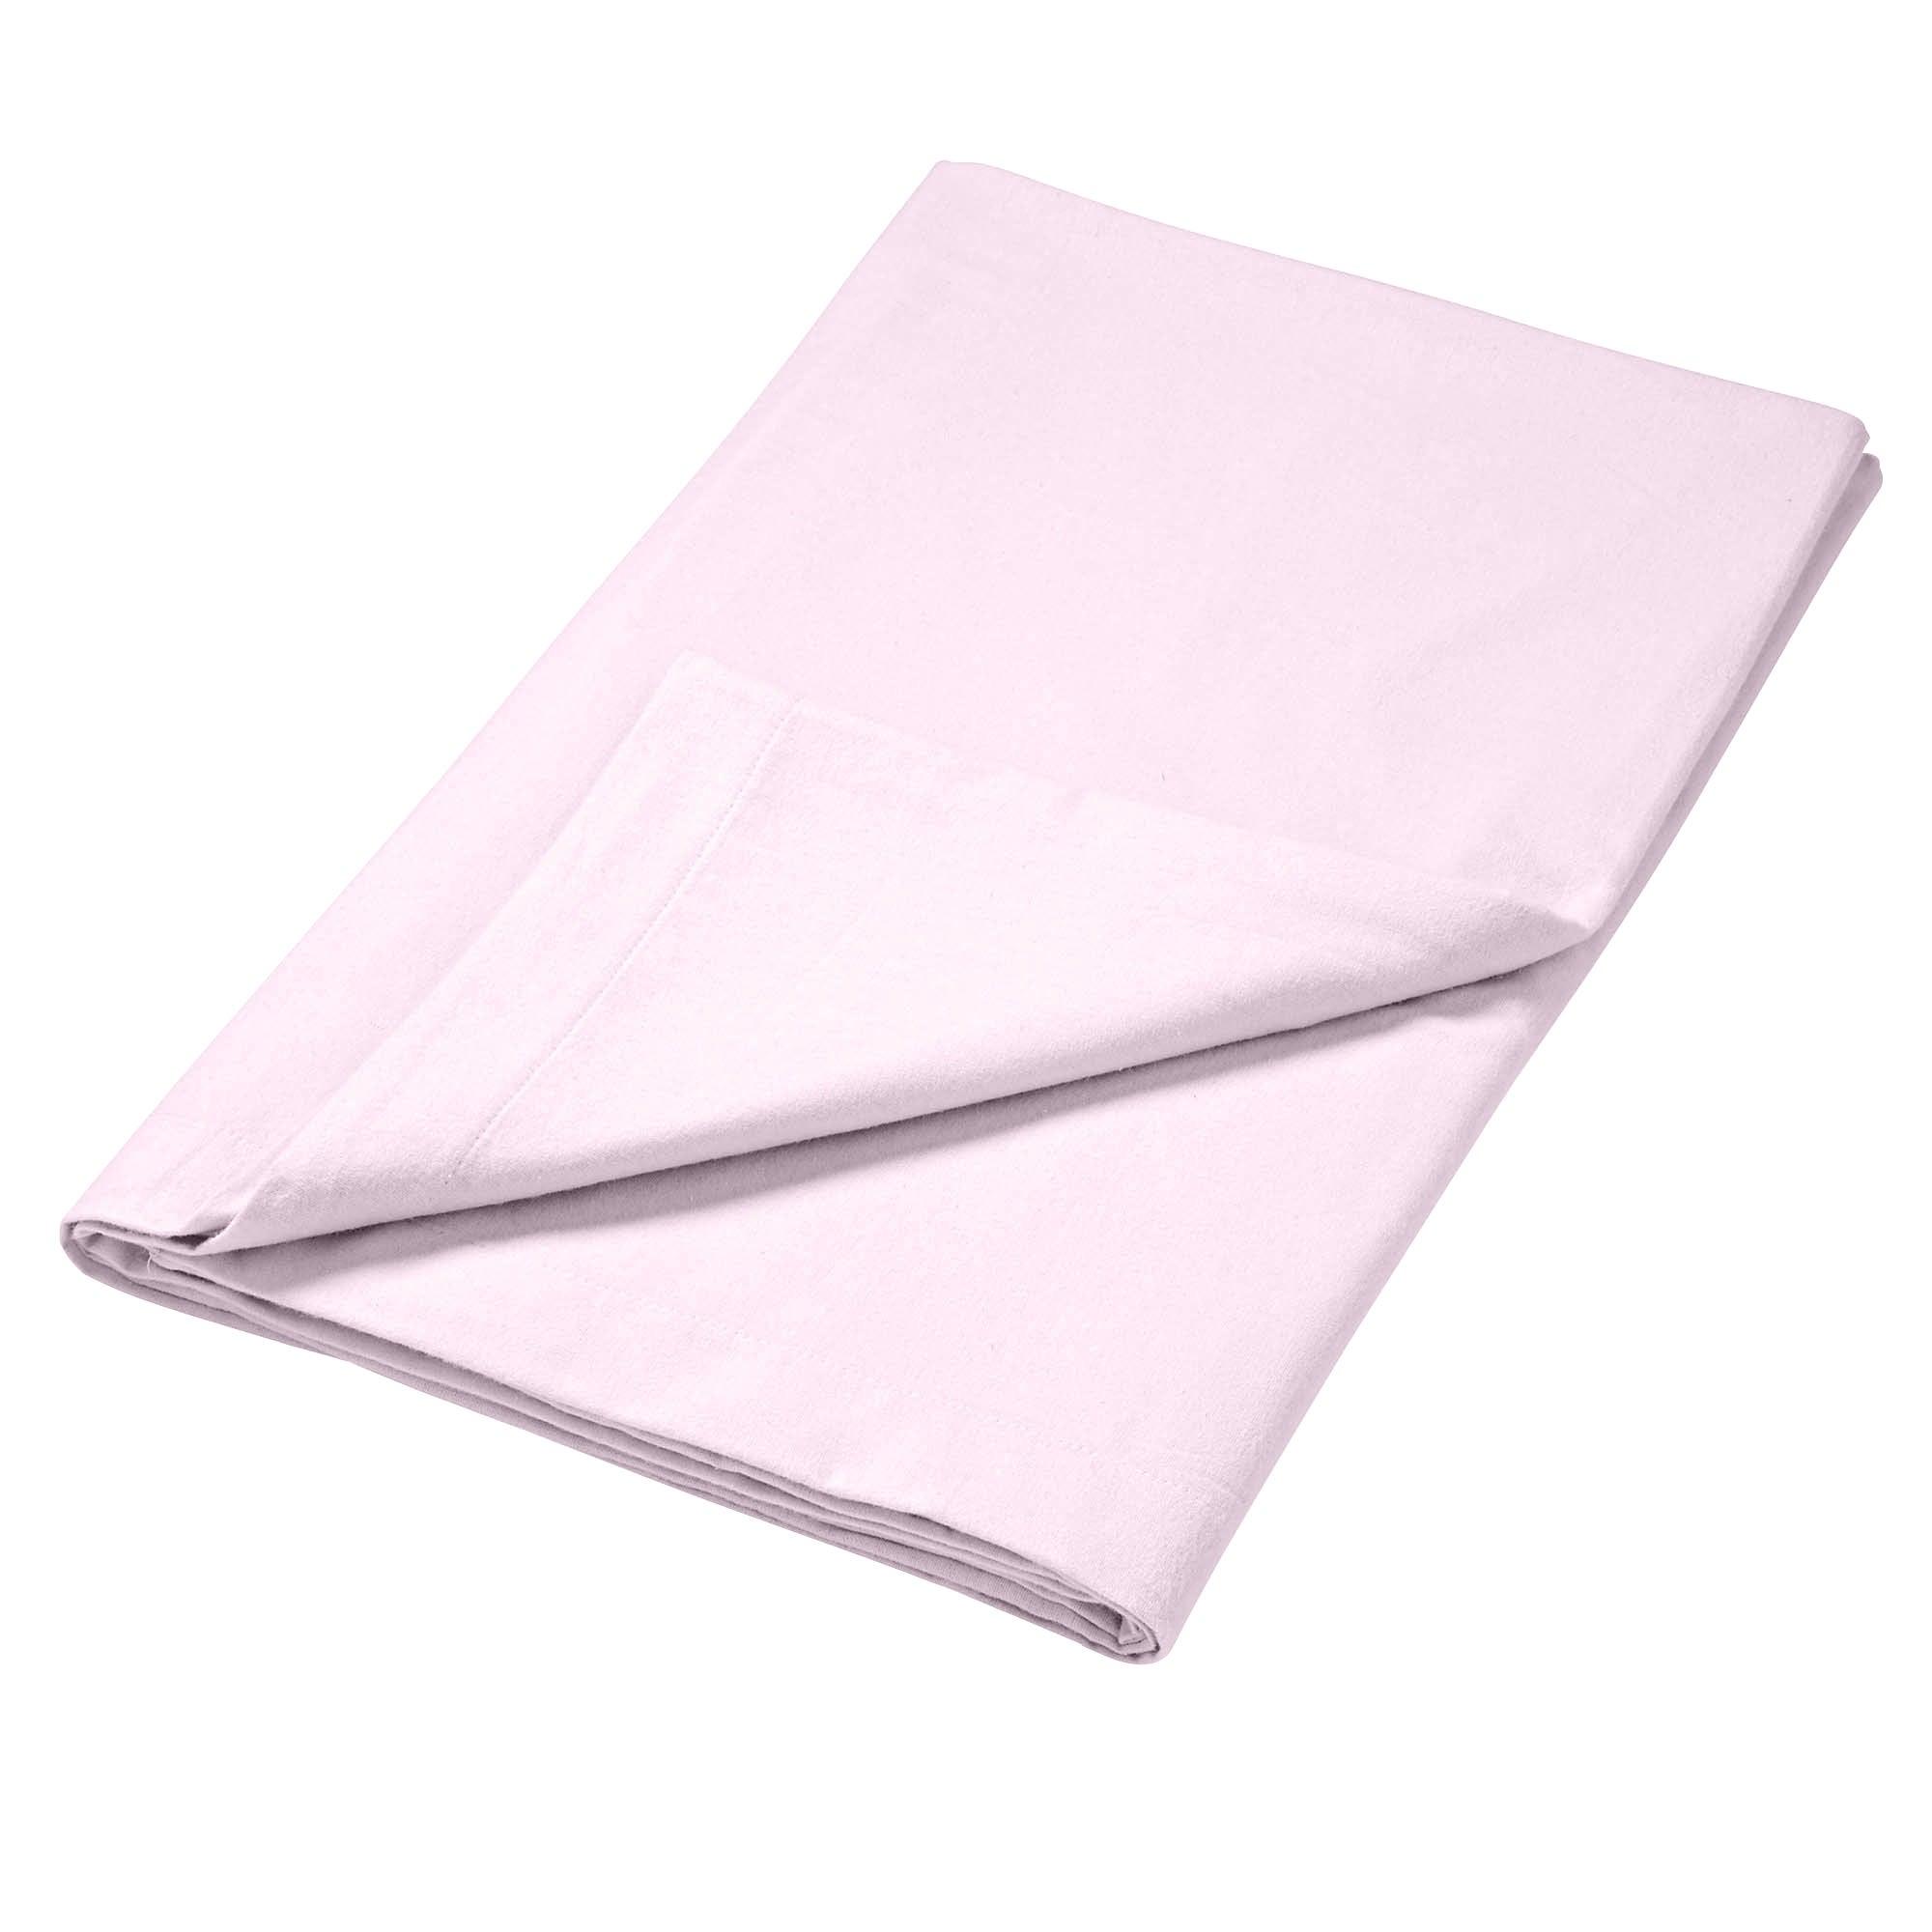 Photo of Luxury brushed cotton flat sheet pink